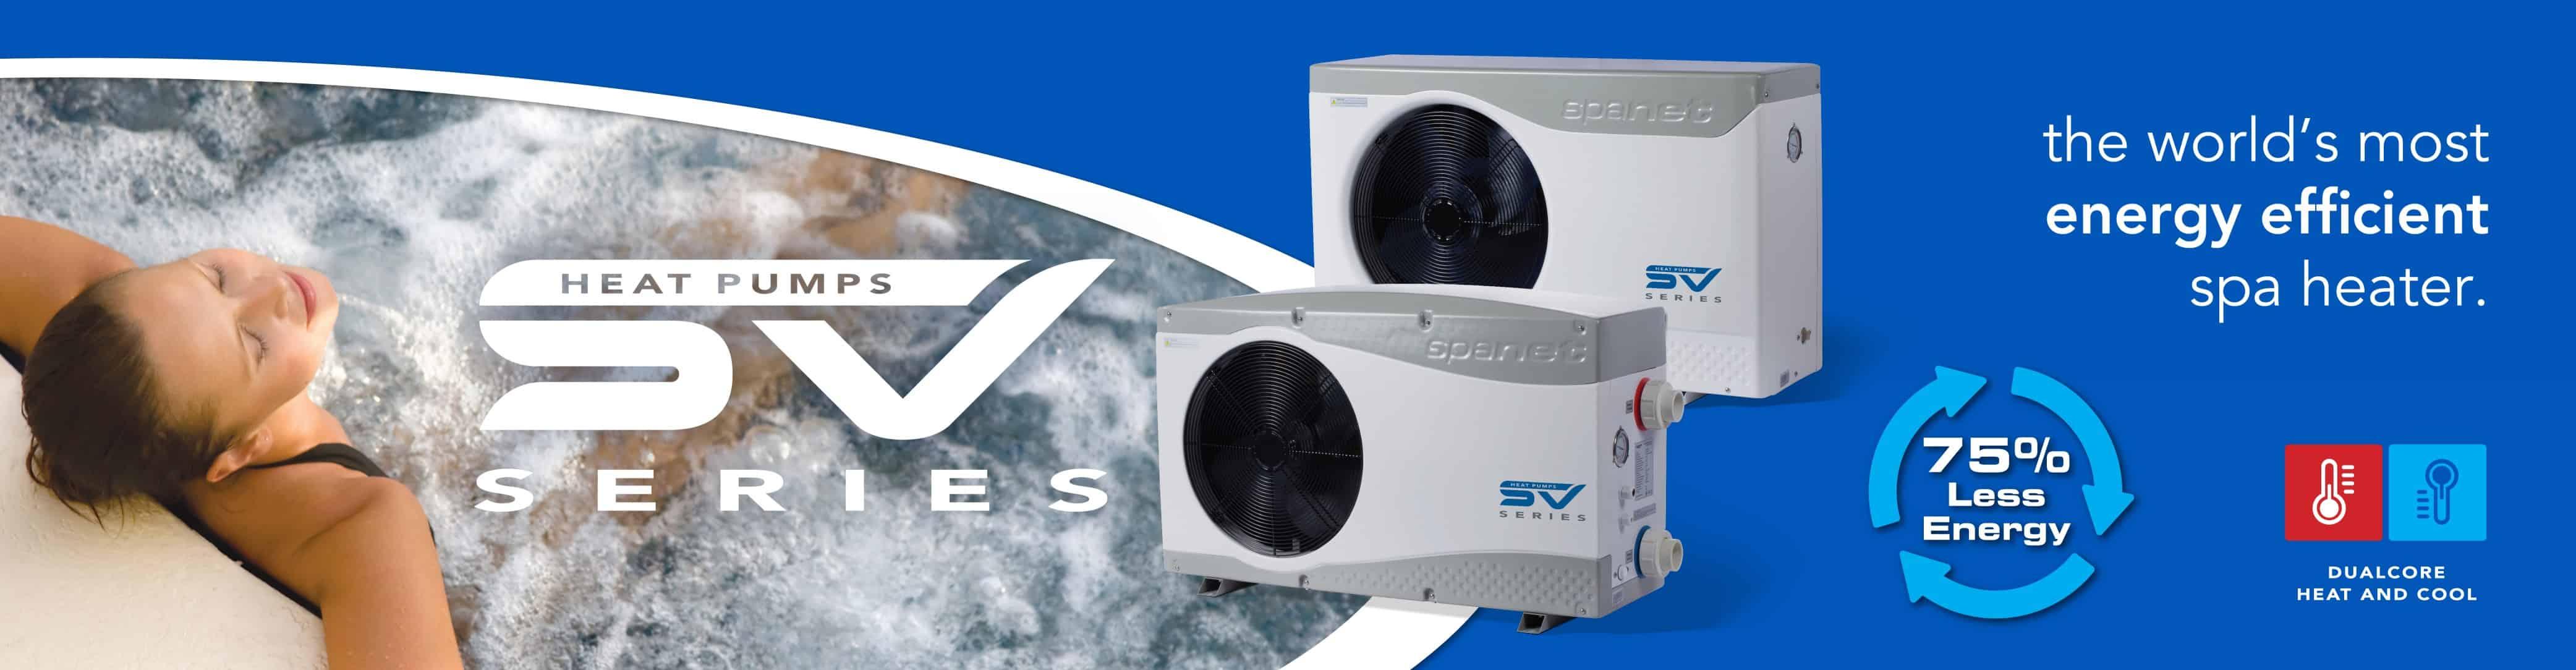 SV Series Heat Pumps